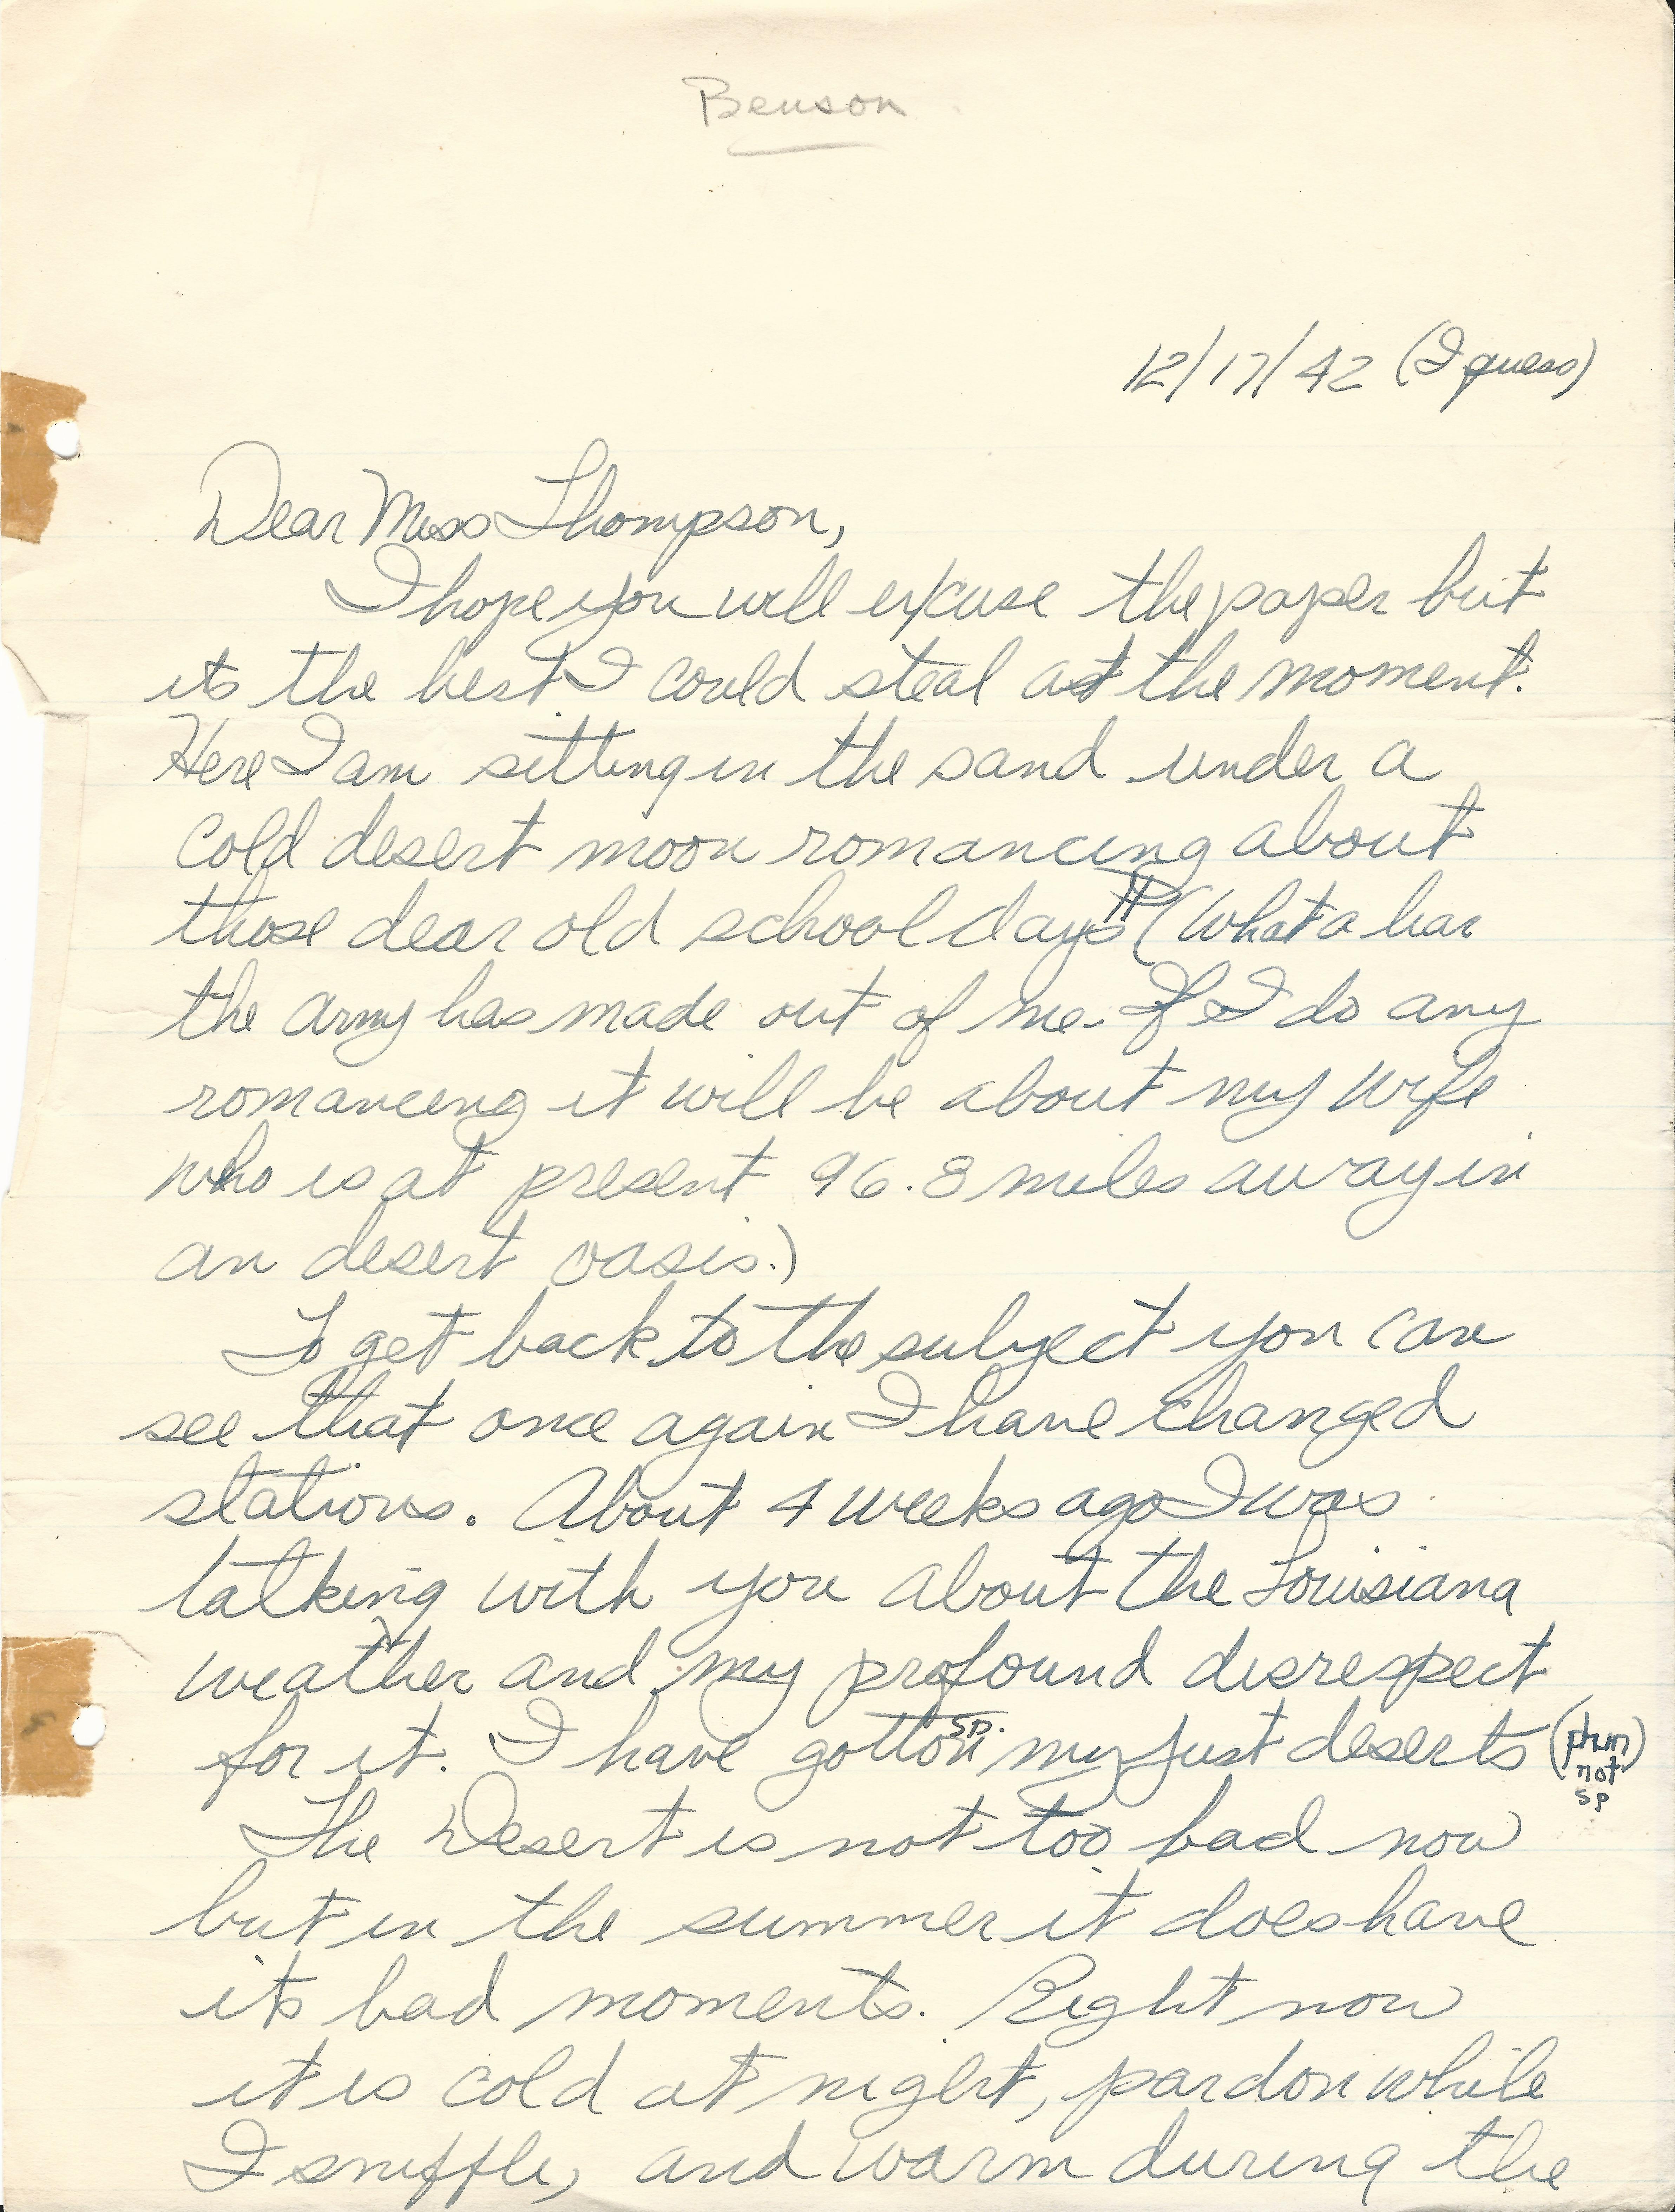 Arthur Benson December 17 1942